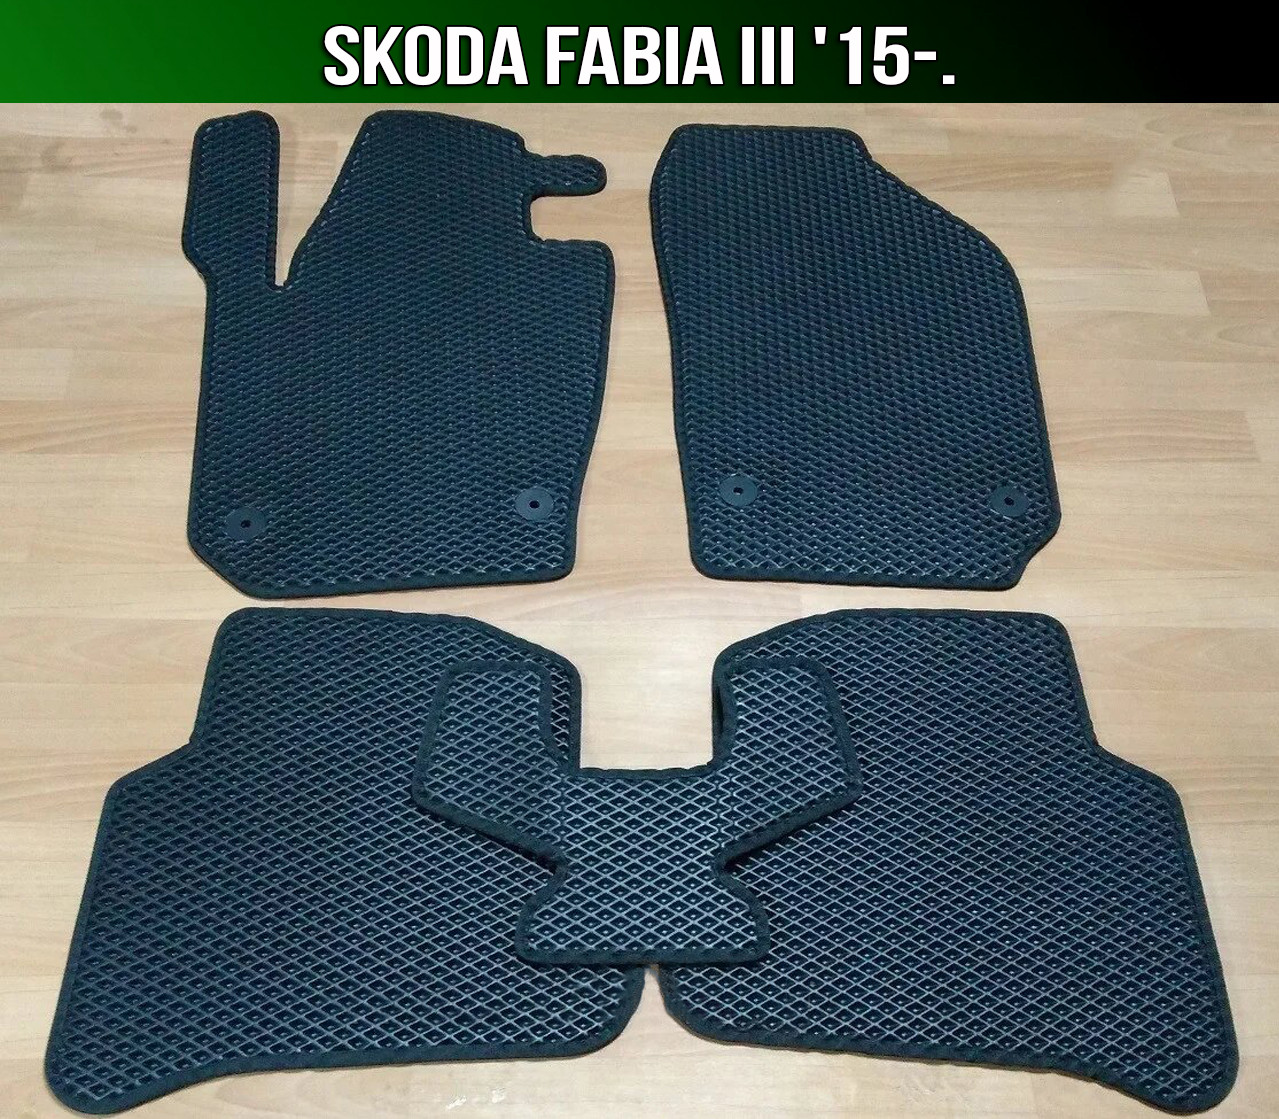 ЕВА коврики на Skoda Fabia III '15-. Ковры EVA Шкода Фабия